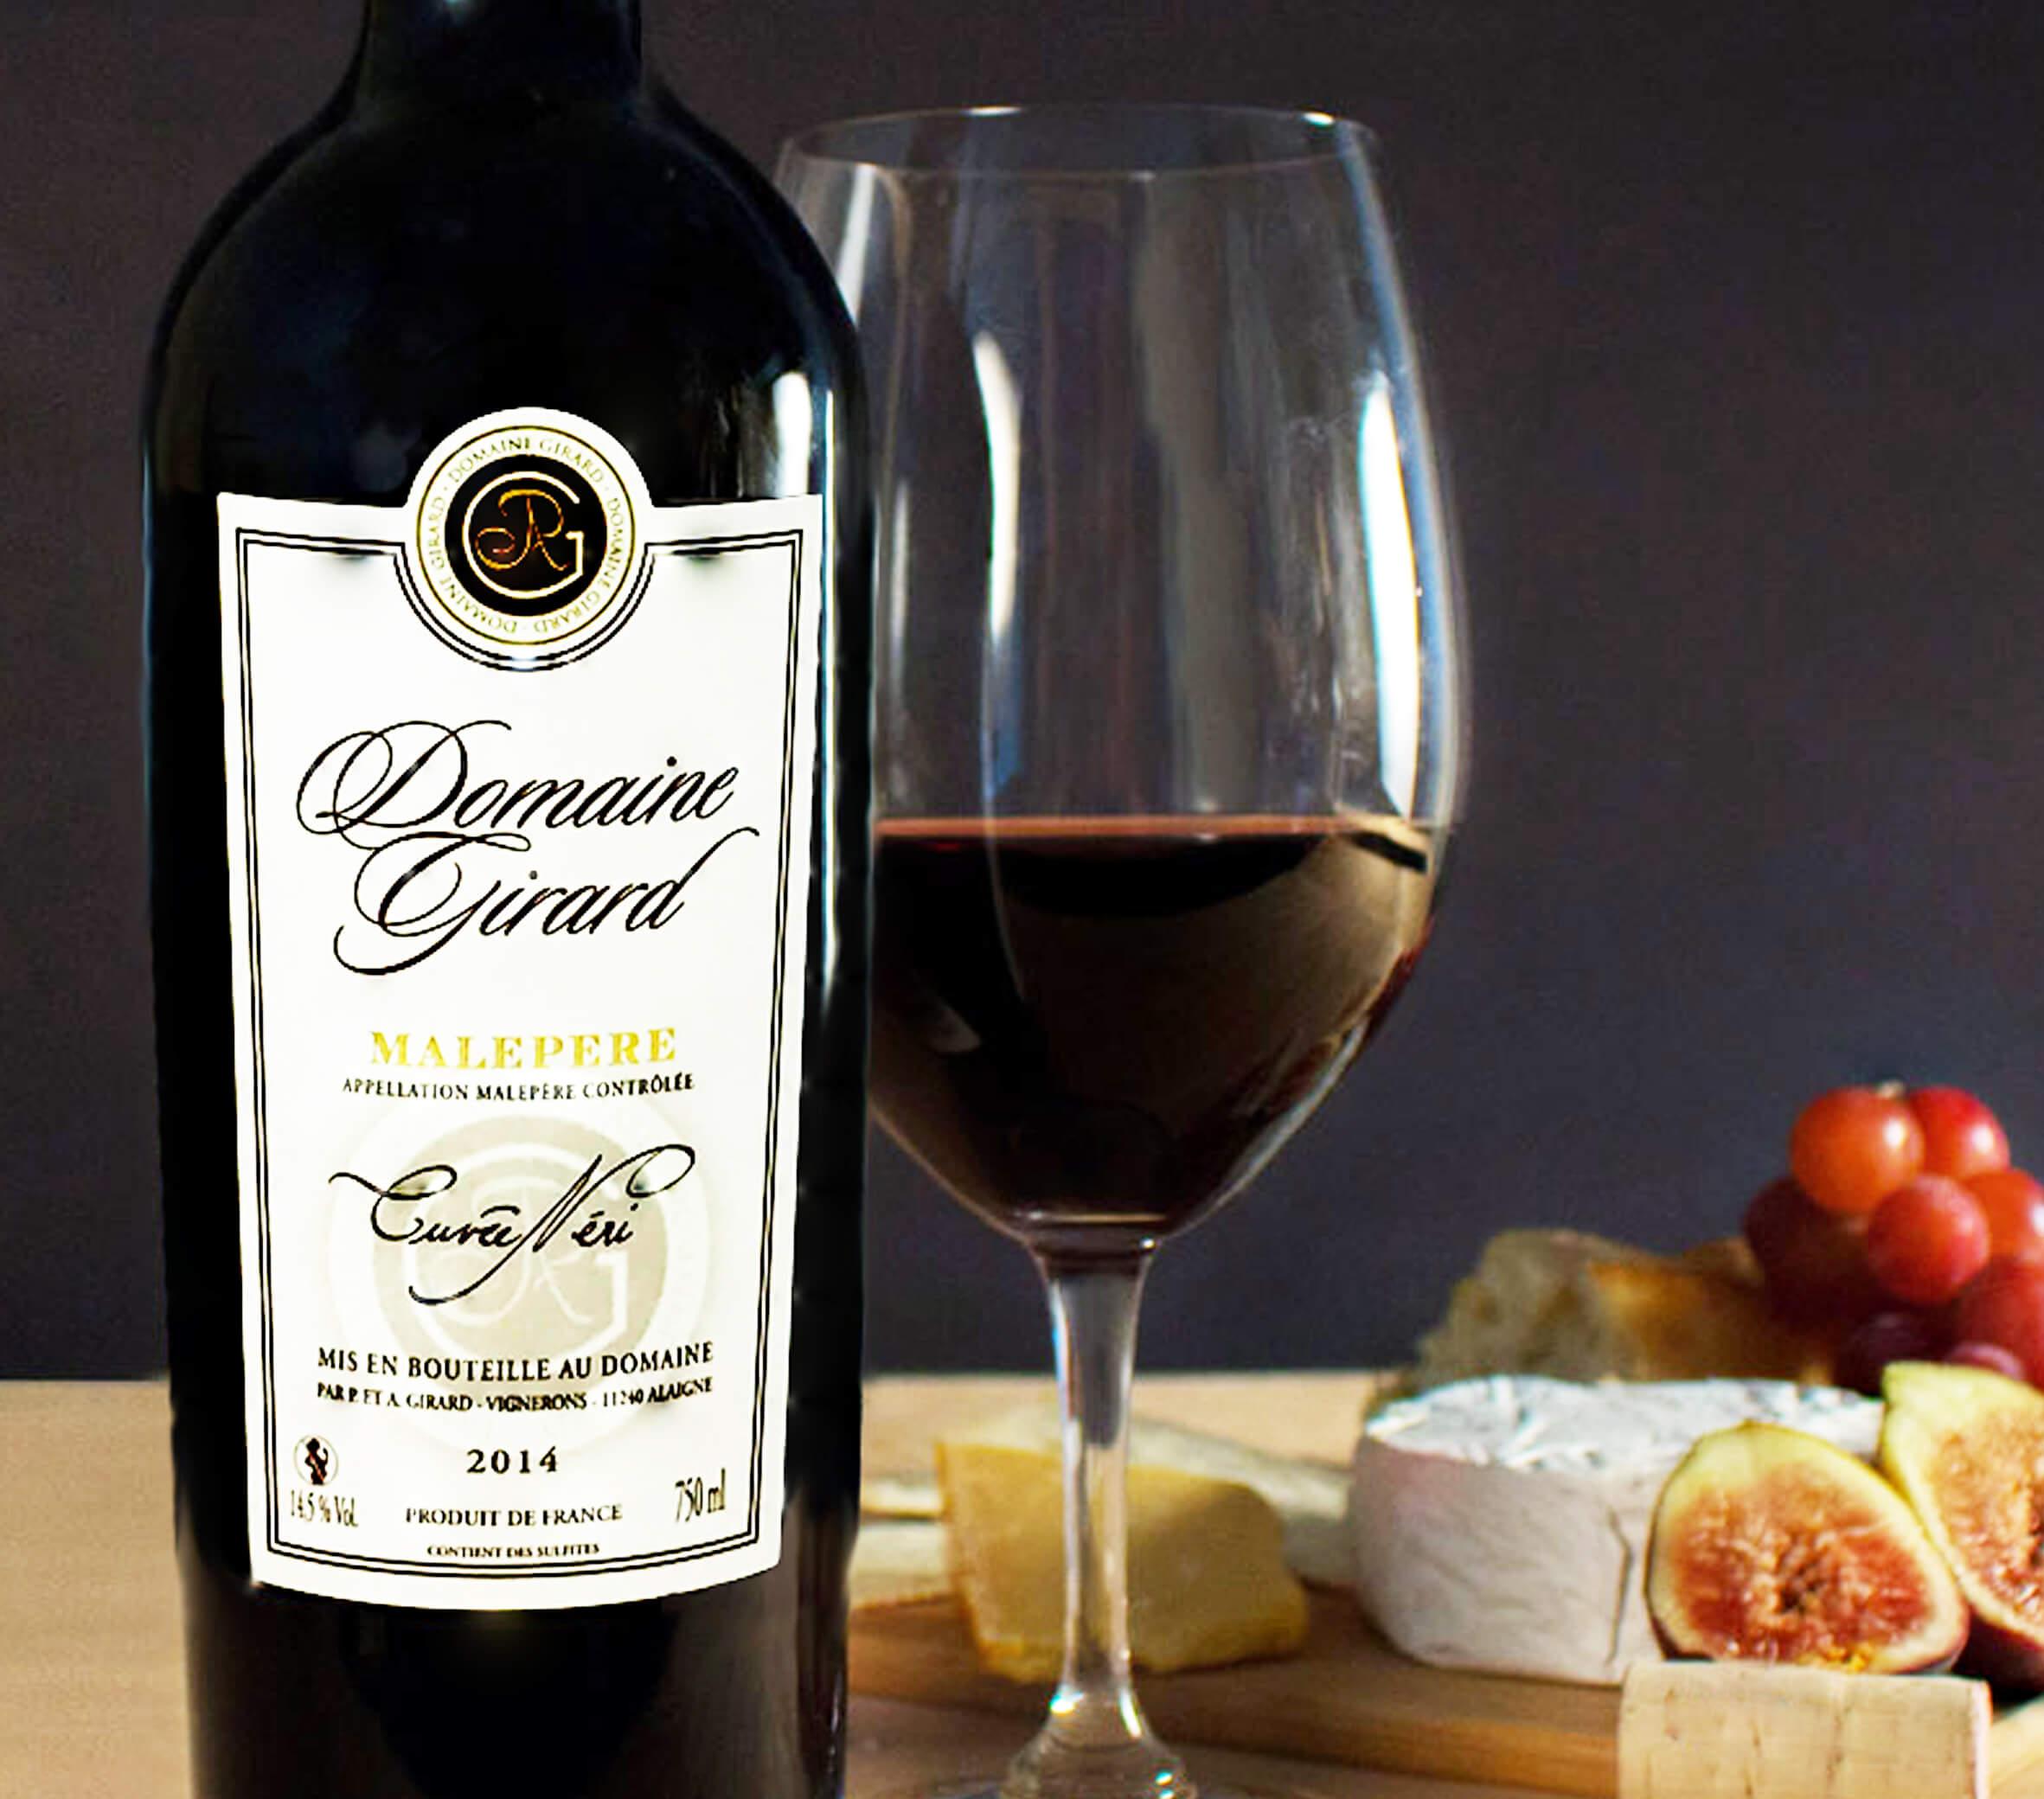 Red Cuvee wines